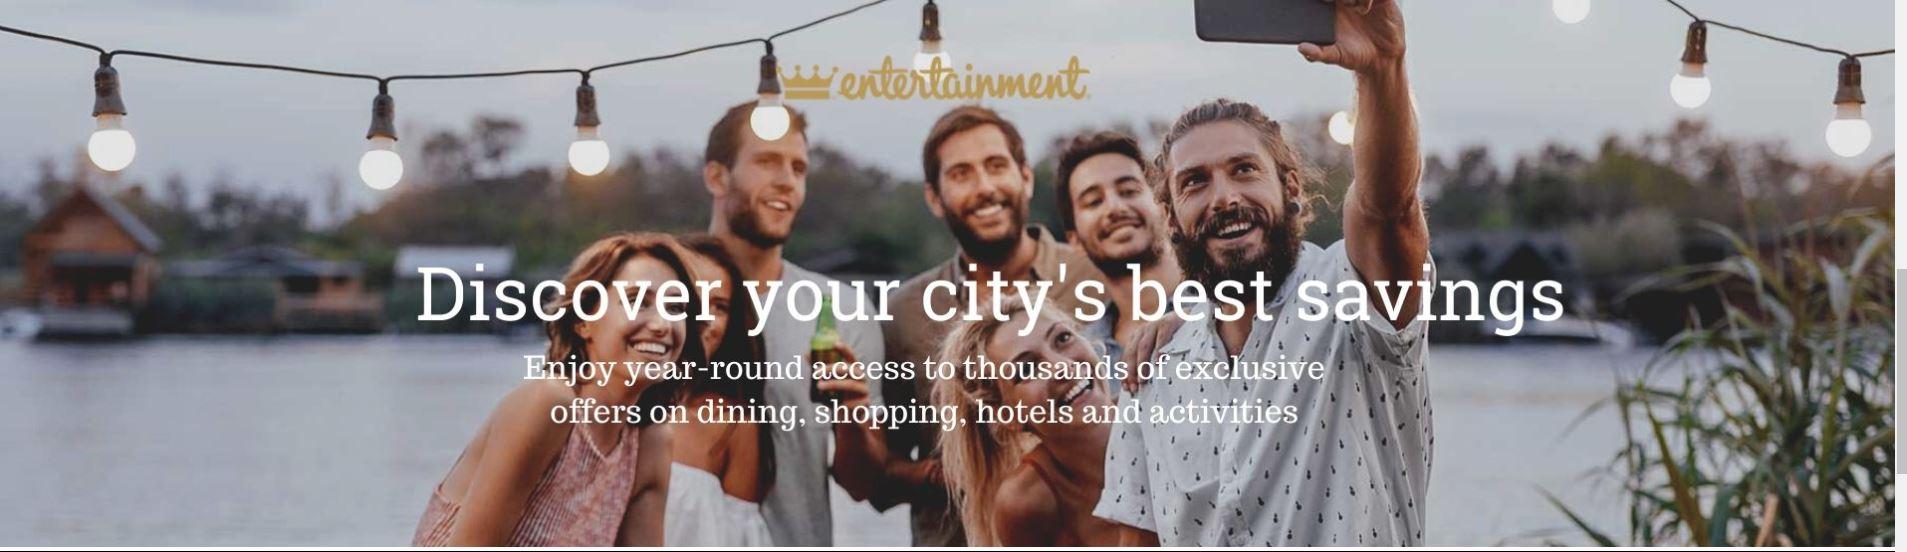 Entertainment Digital Membership